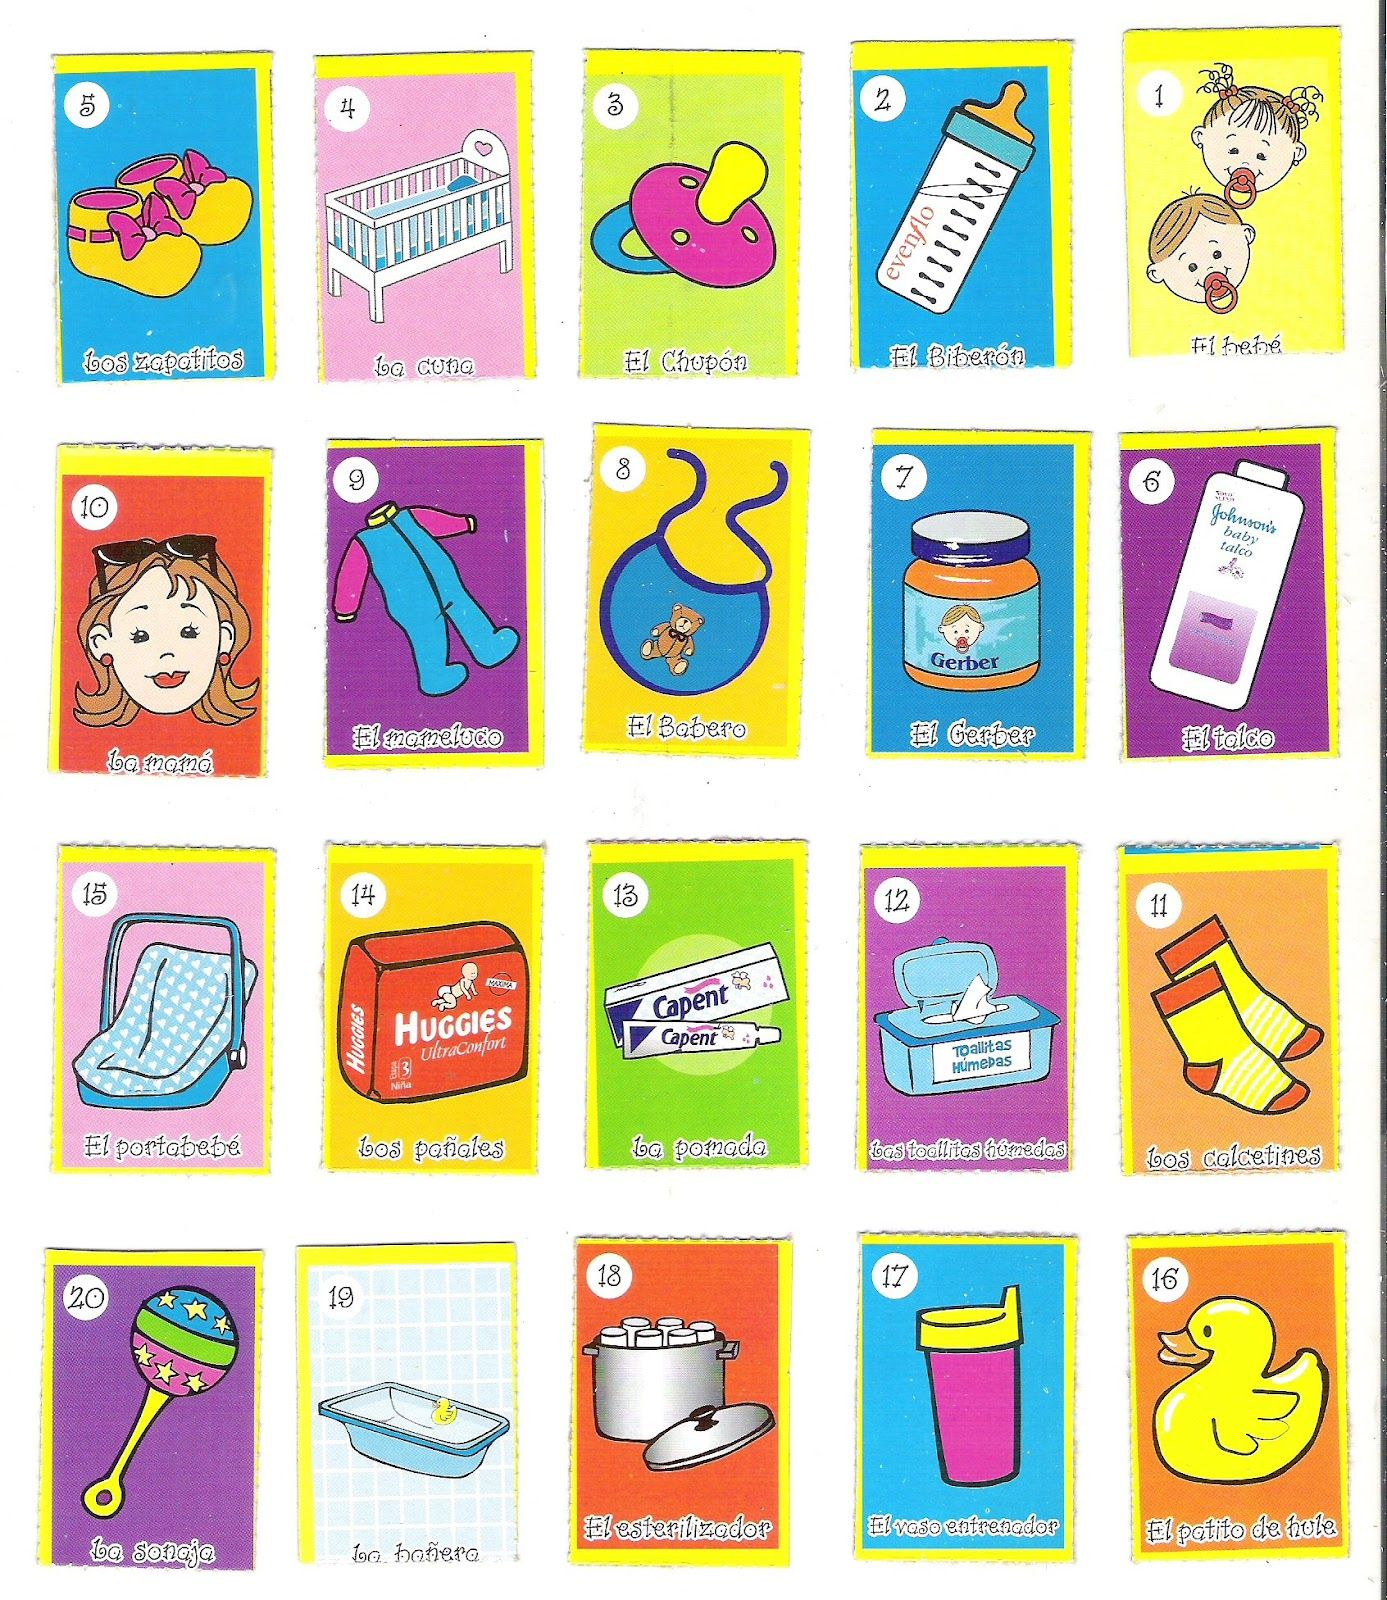 Loteria Para Baby Shower Imprimir Gratis Pdf Imagui | fiestas ...